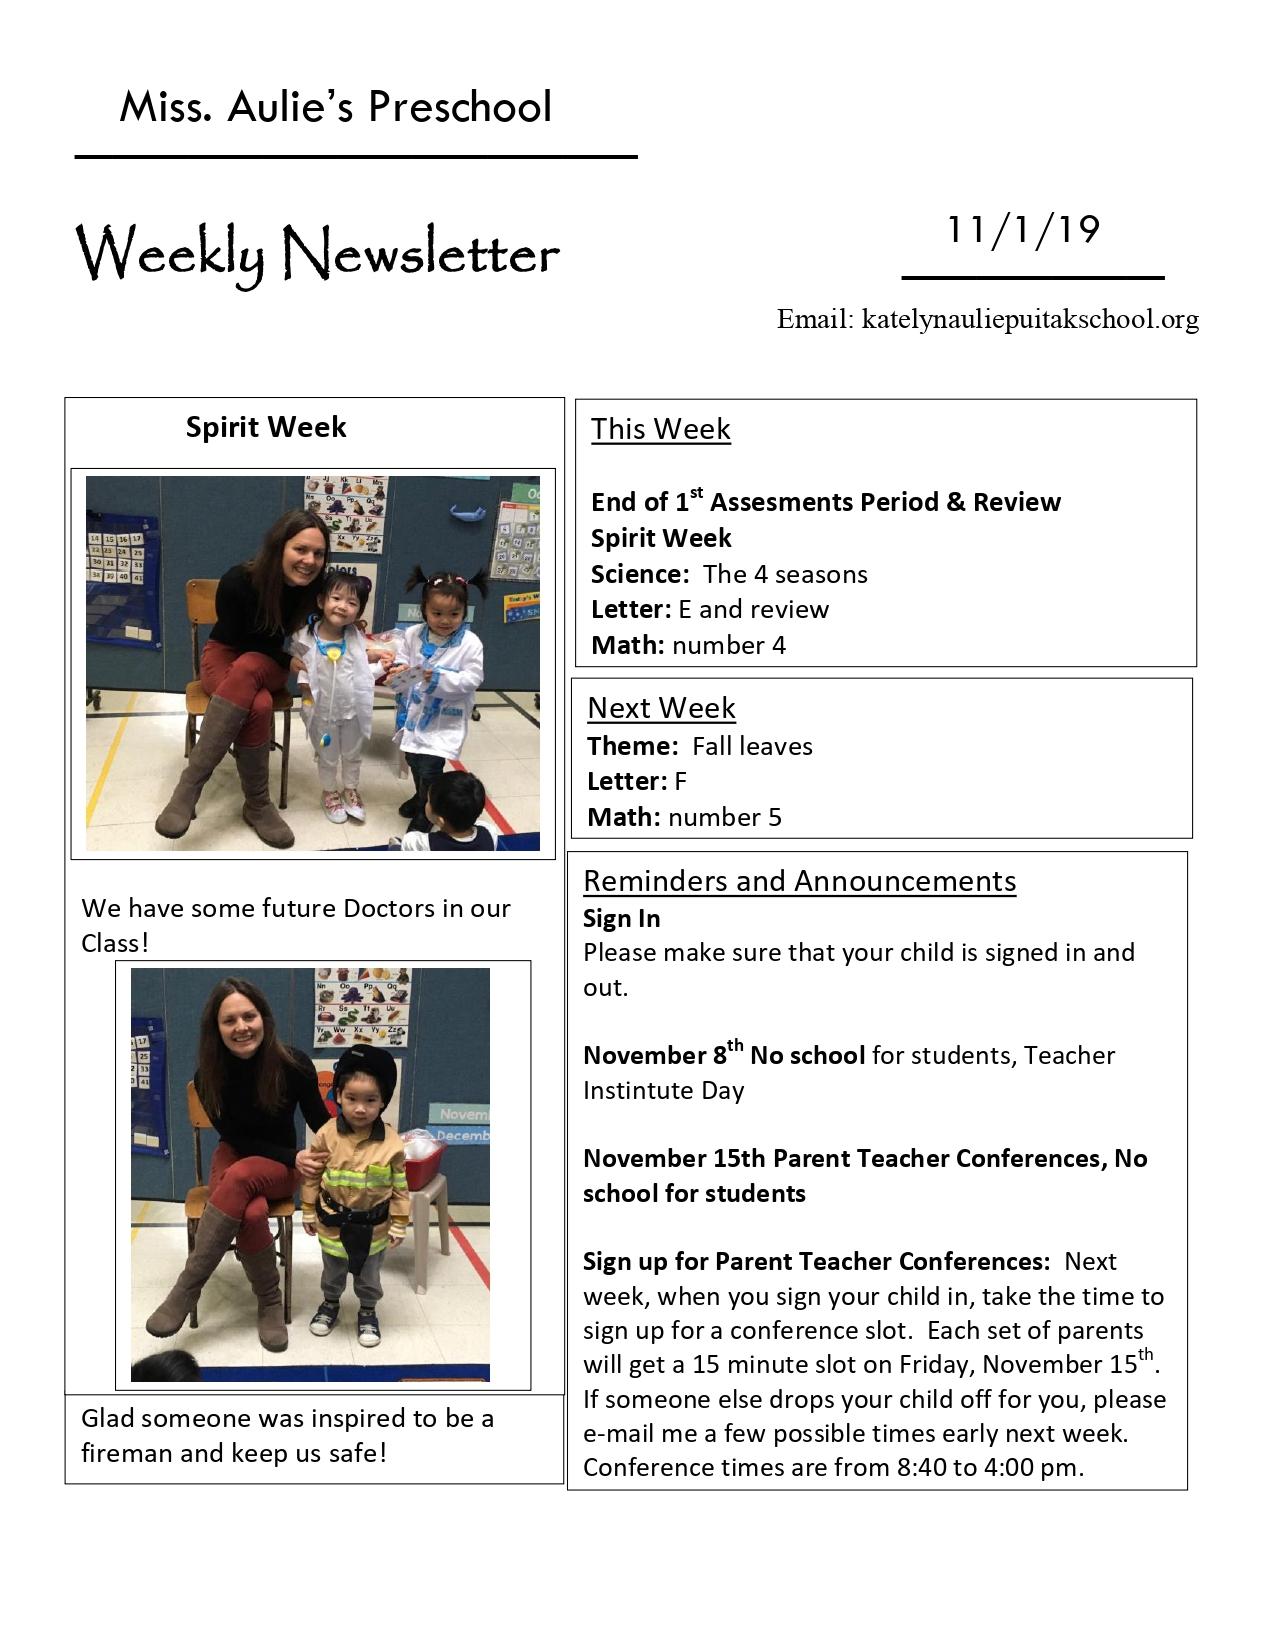 KatelynNewsletter2019October5thWeek_page